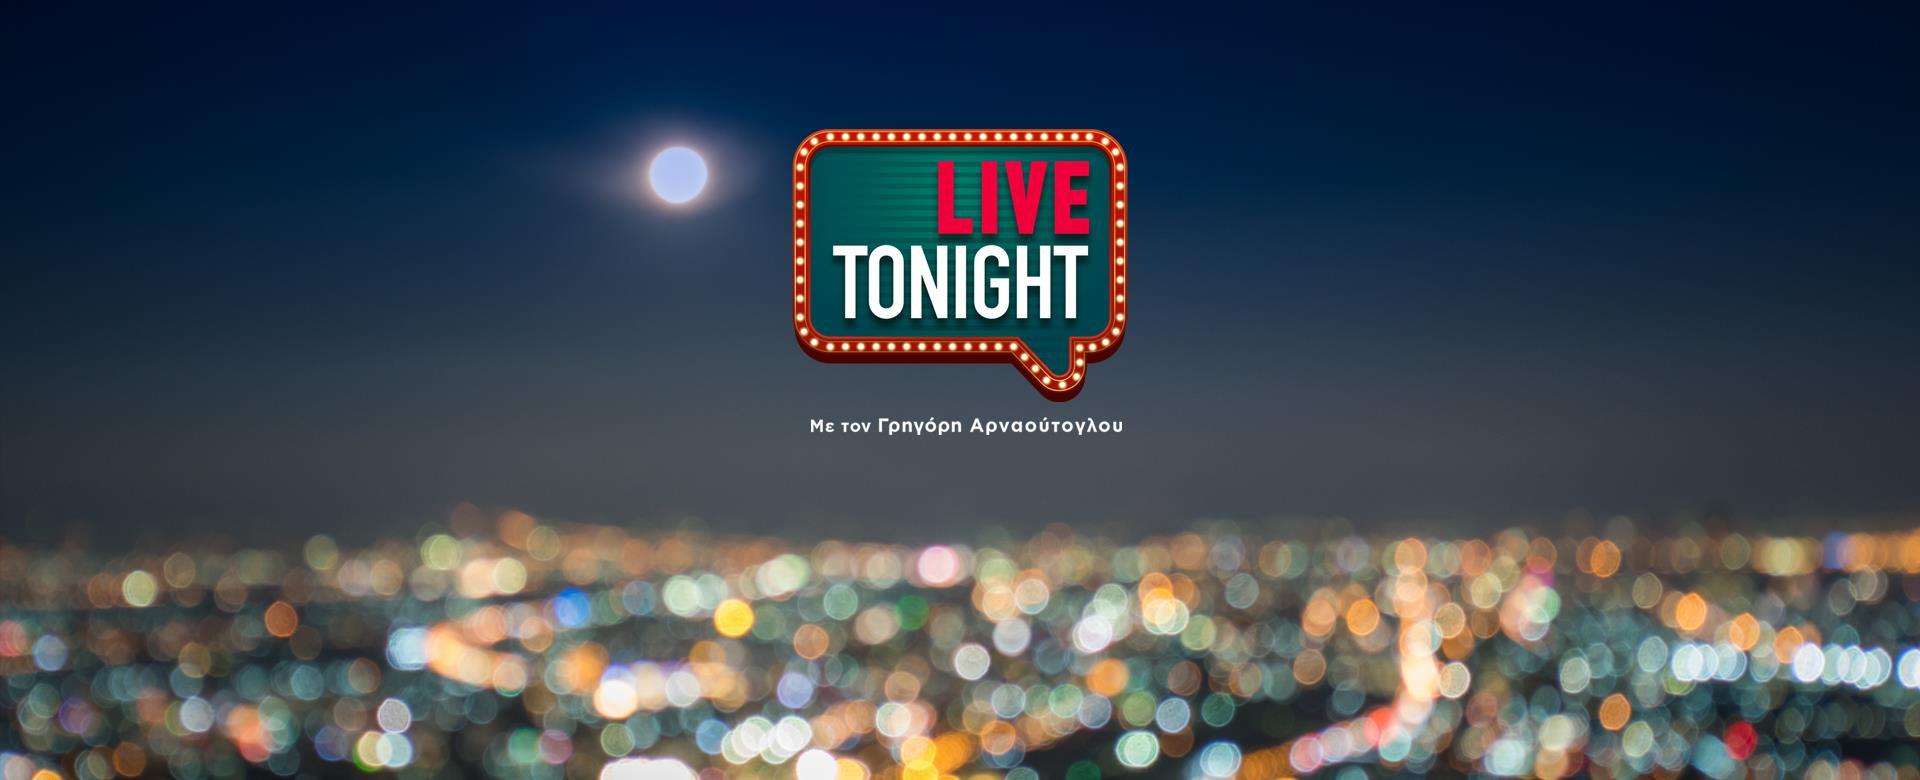 LIVE TONIGHT